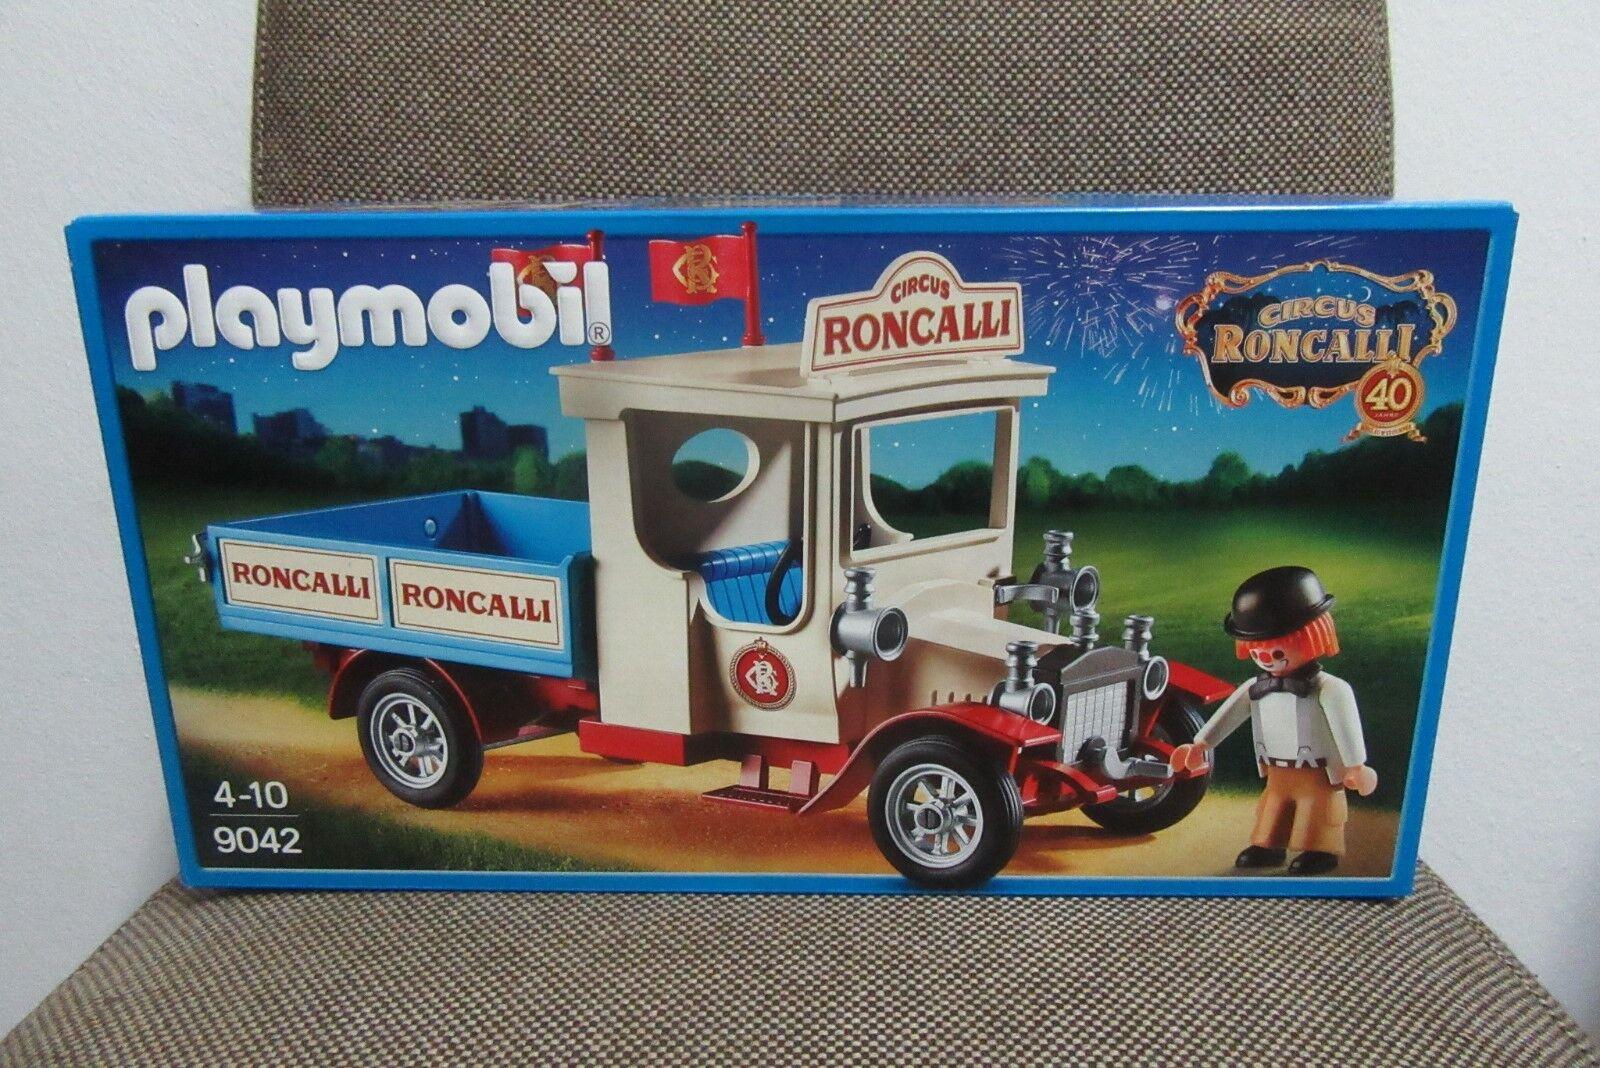 Playmobil - Promocional - Vehiculo Camion Circo Roncalli - 9042 - (NUEVO) OVP